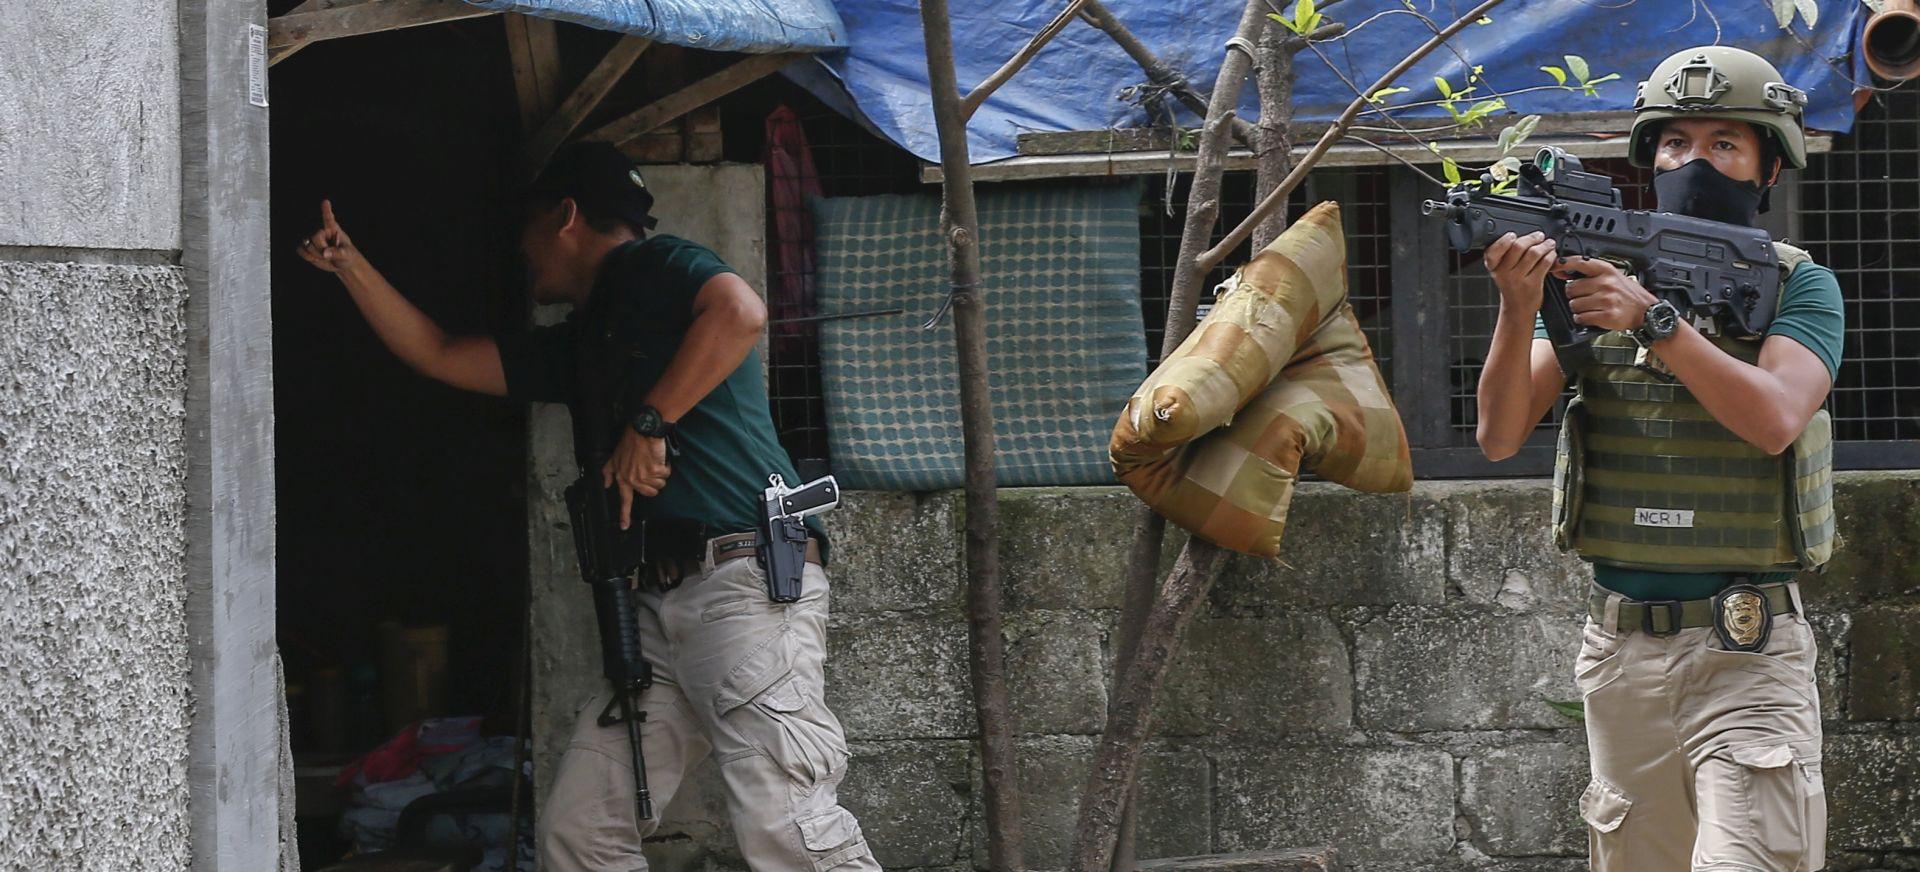 Duterteov rat protiv droge pod istragom ICC-a